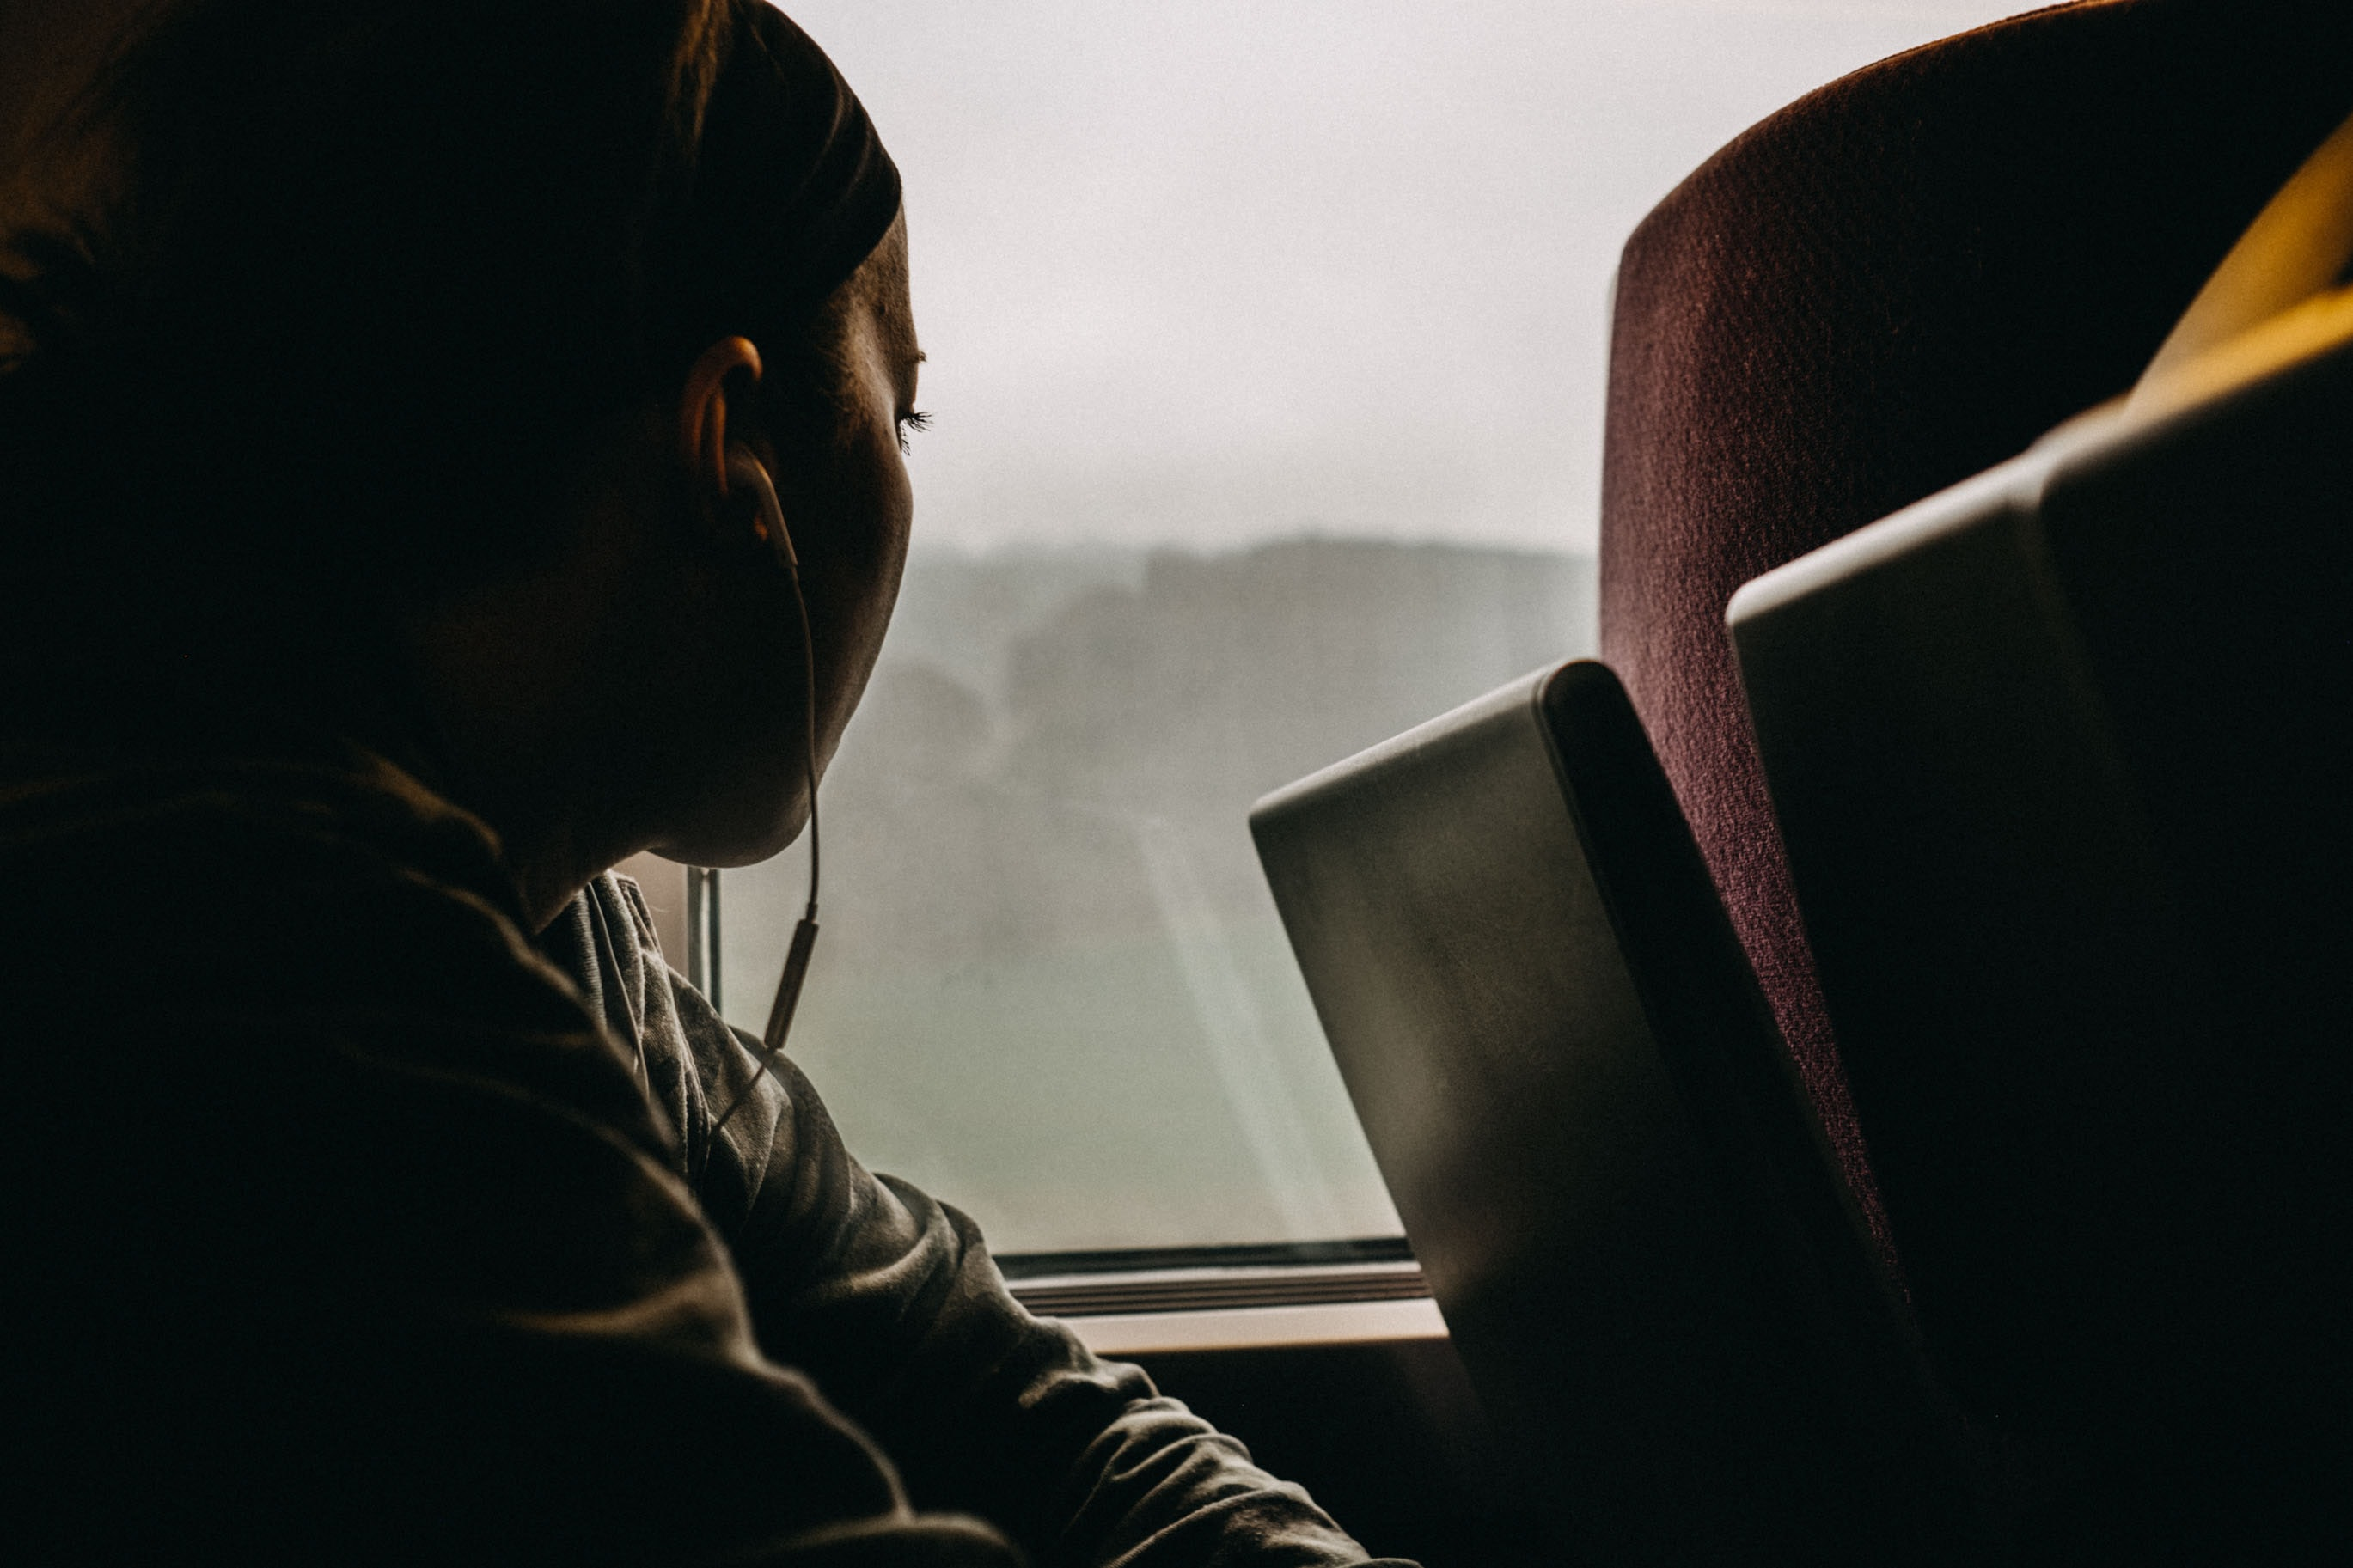 person using earphones looking through window